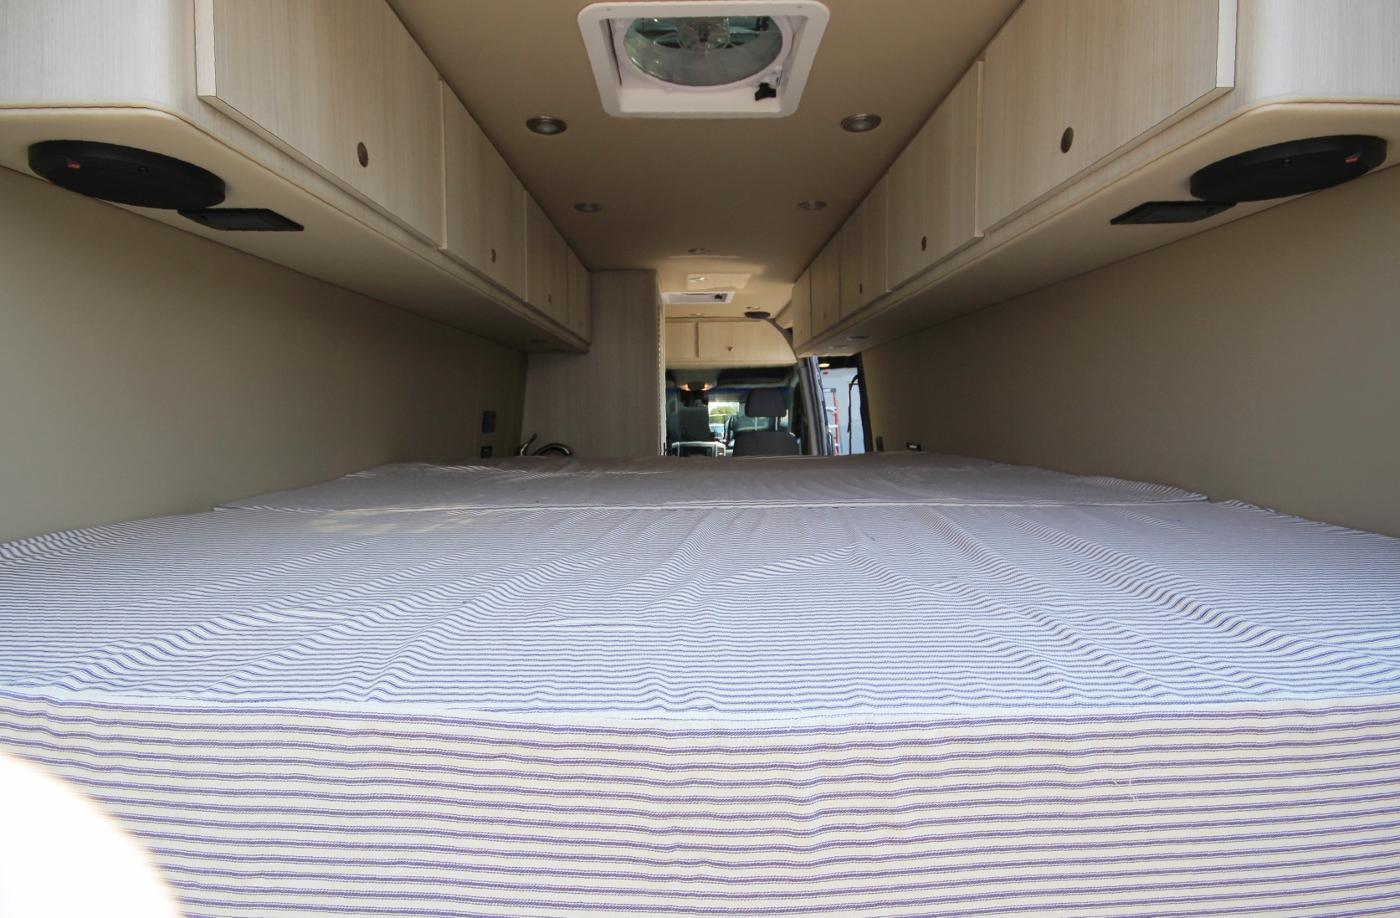 Outdoor Lifestyle 4x4 Camping Van